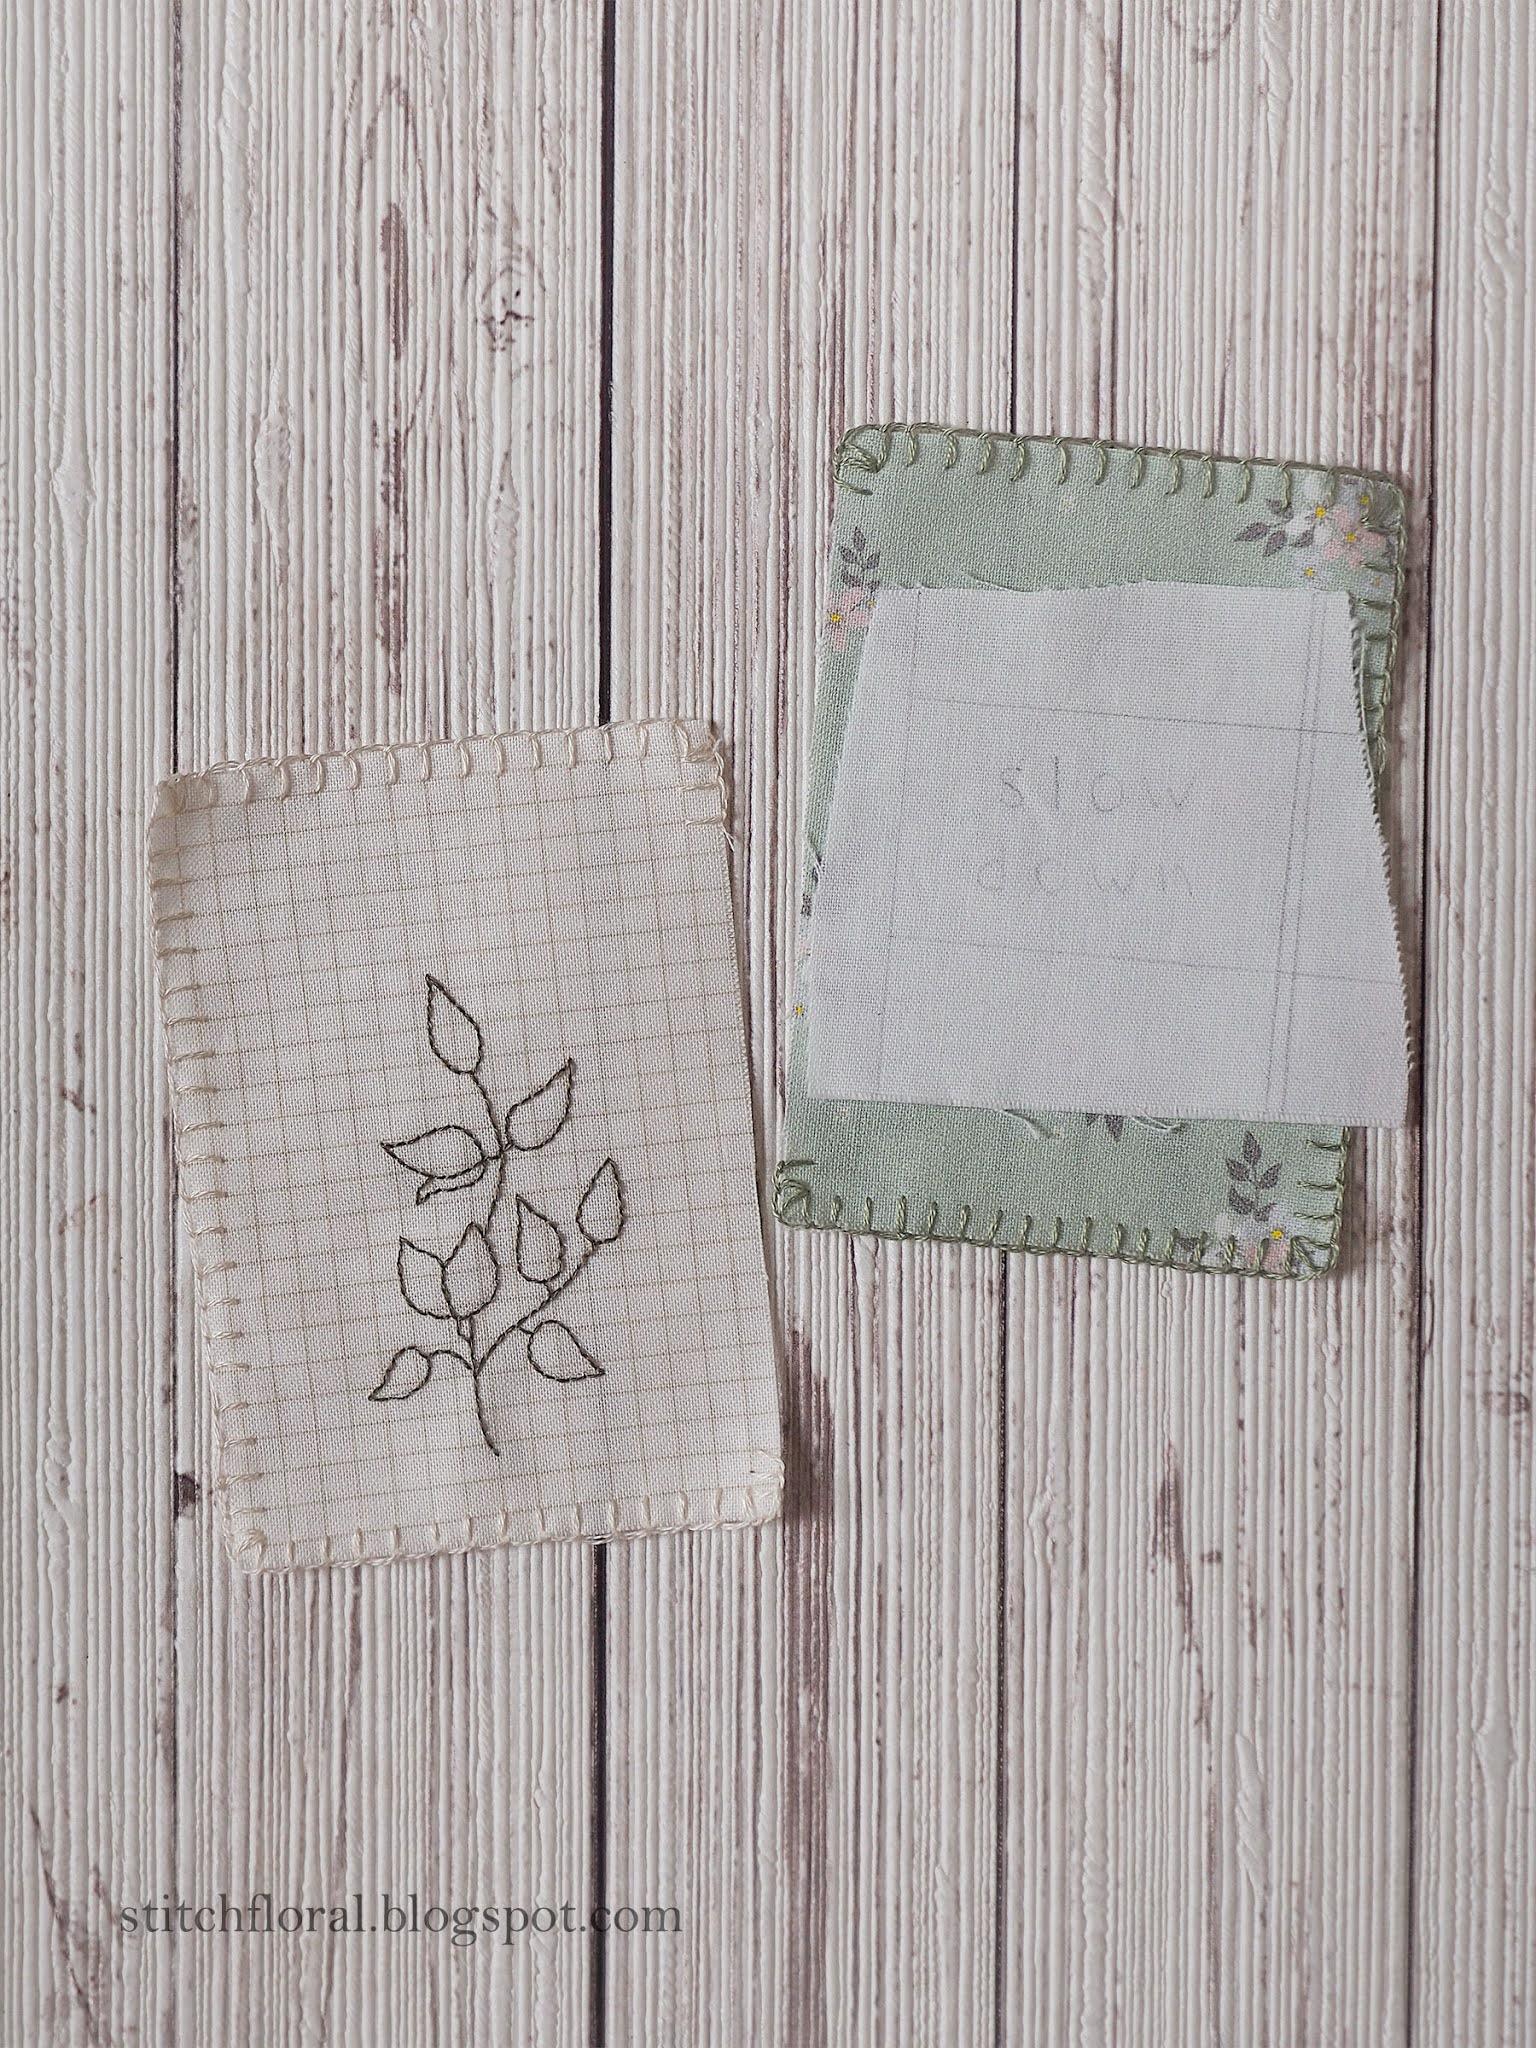 stitch book journal